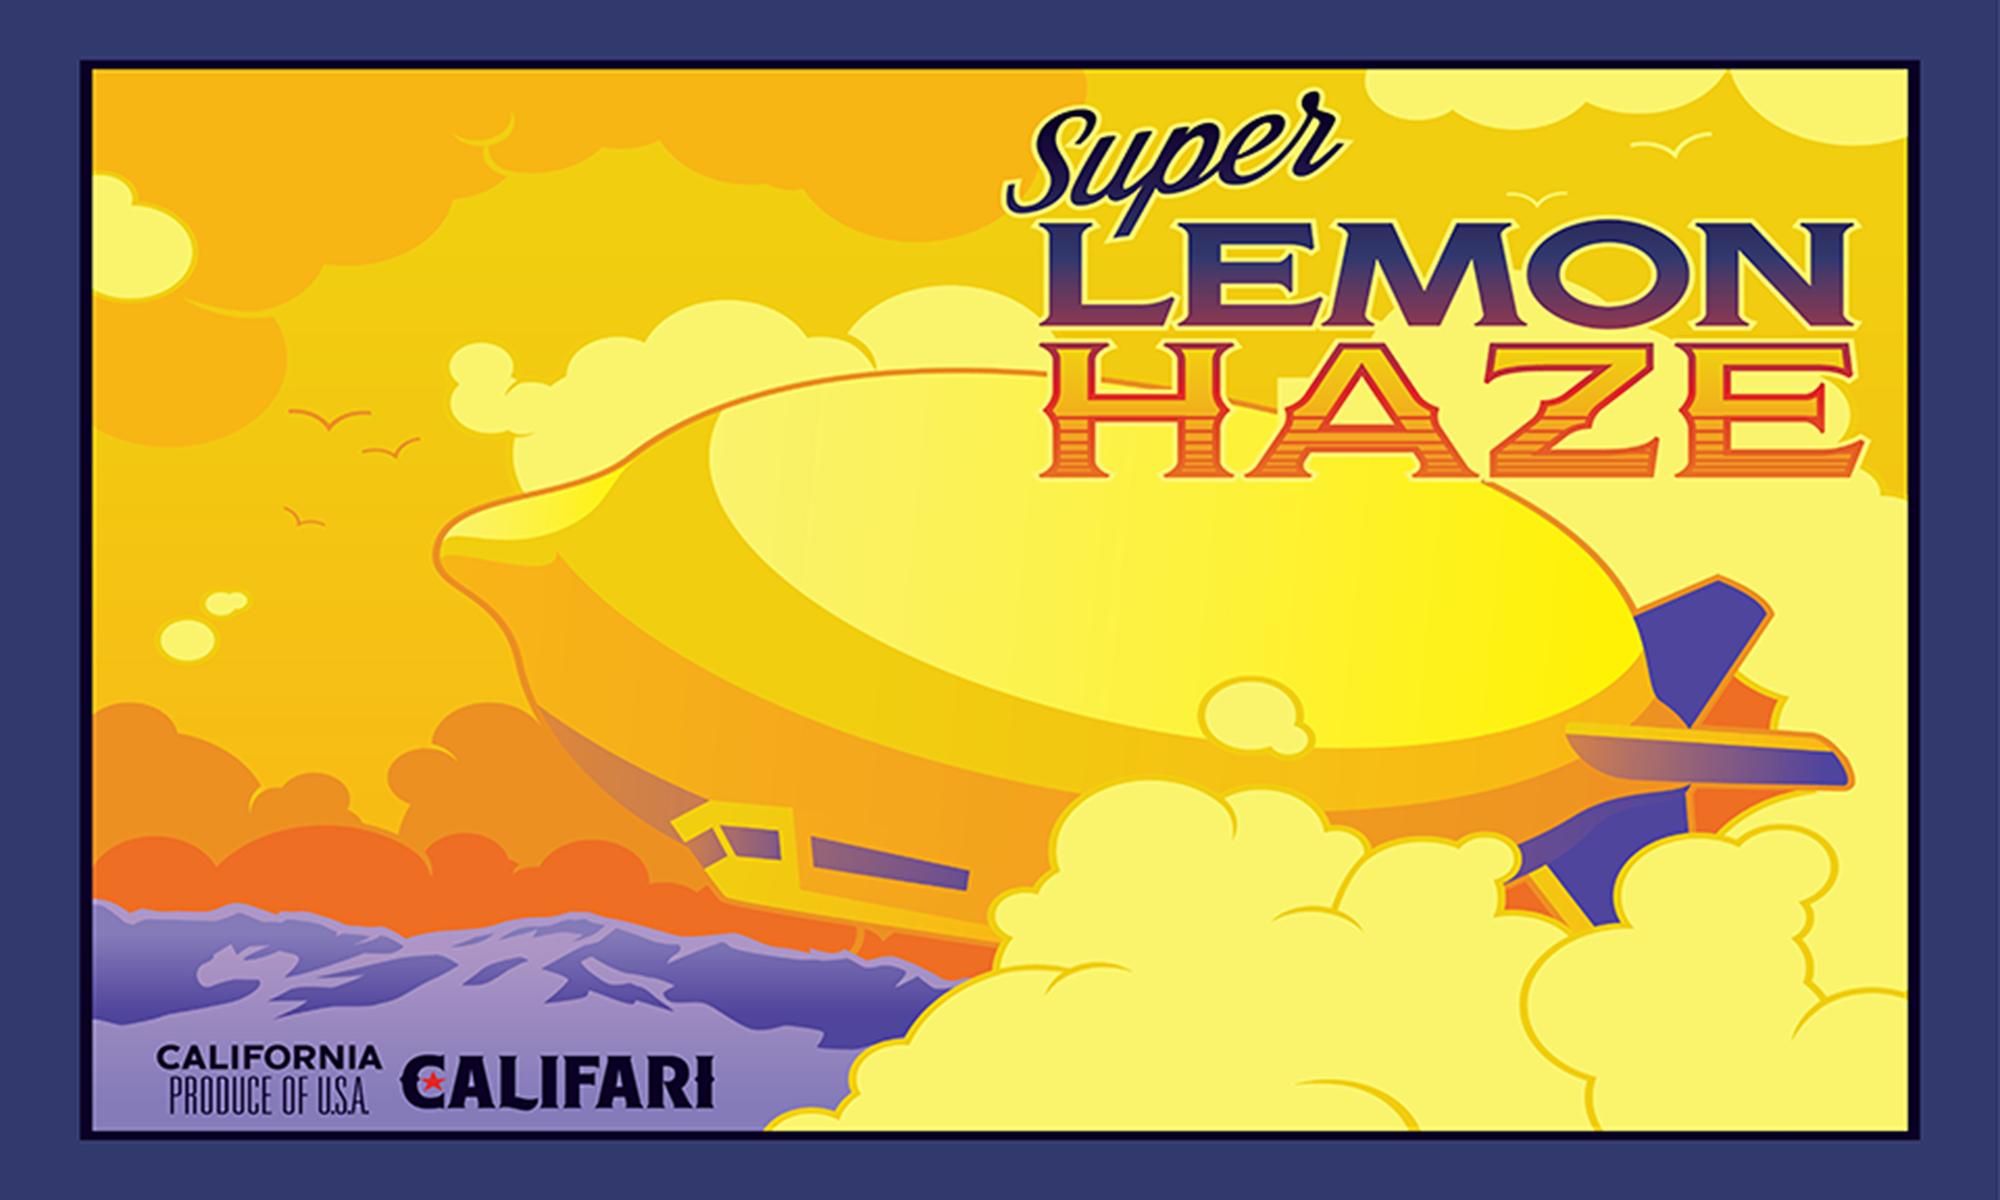 Super Lemon Haze by Timothy Watters